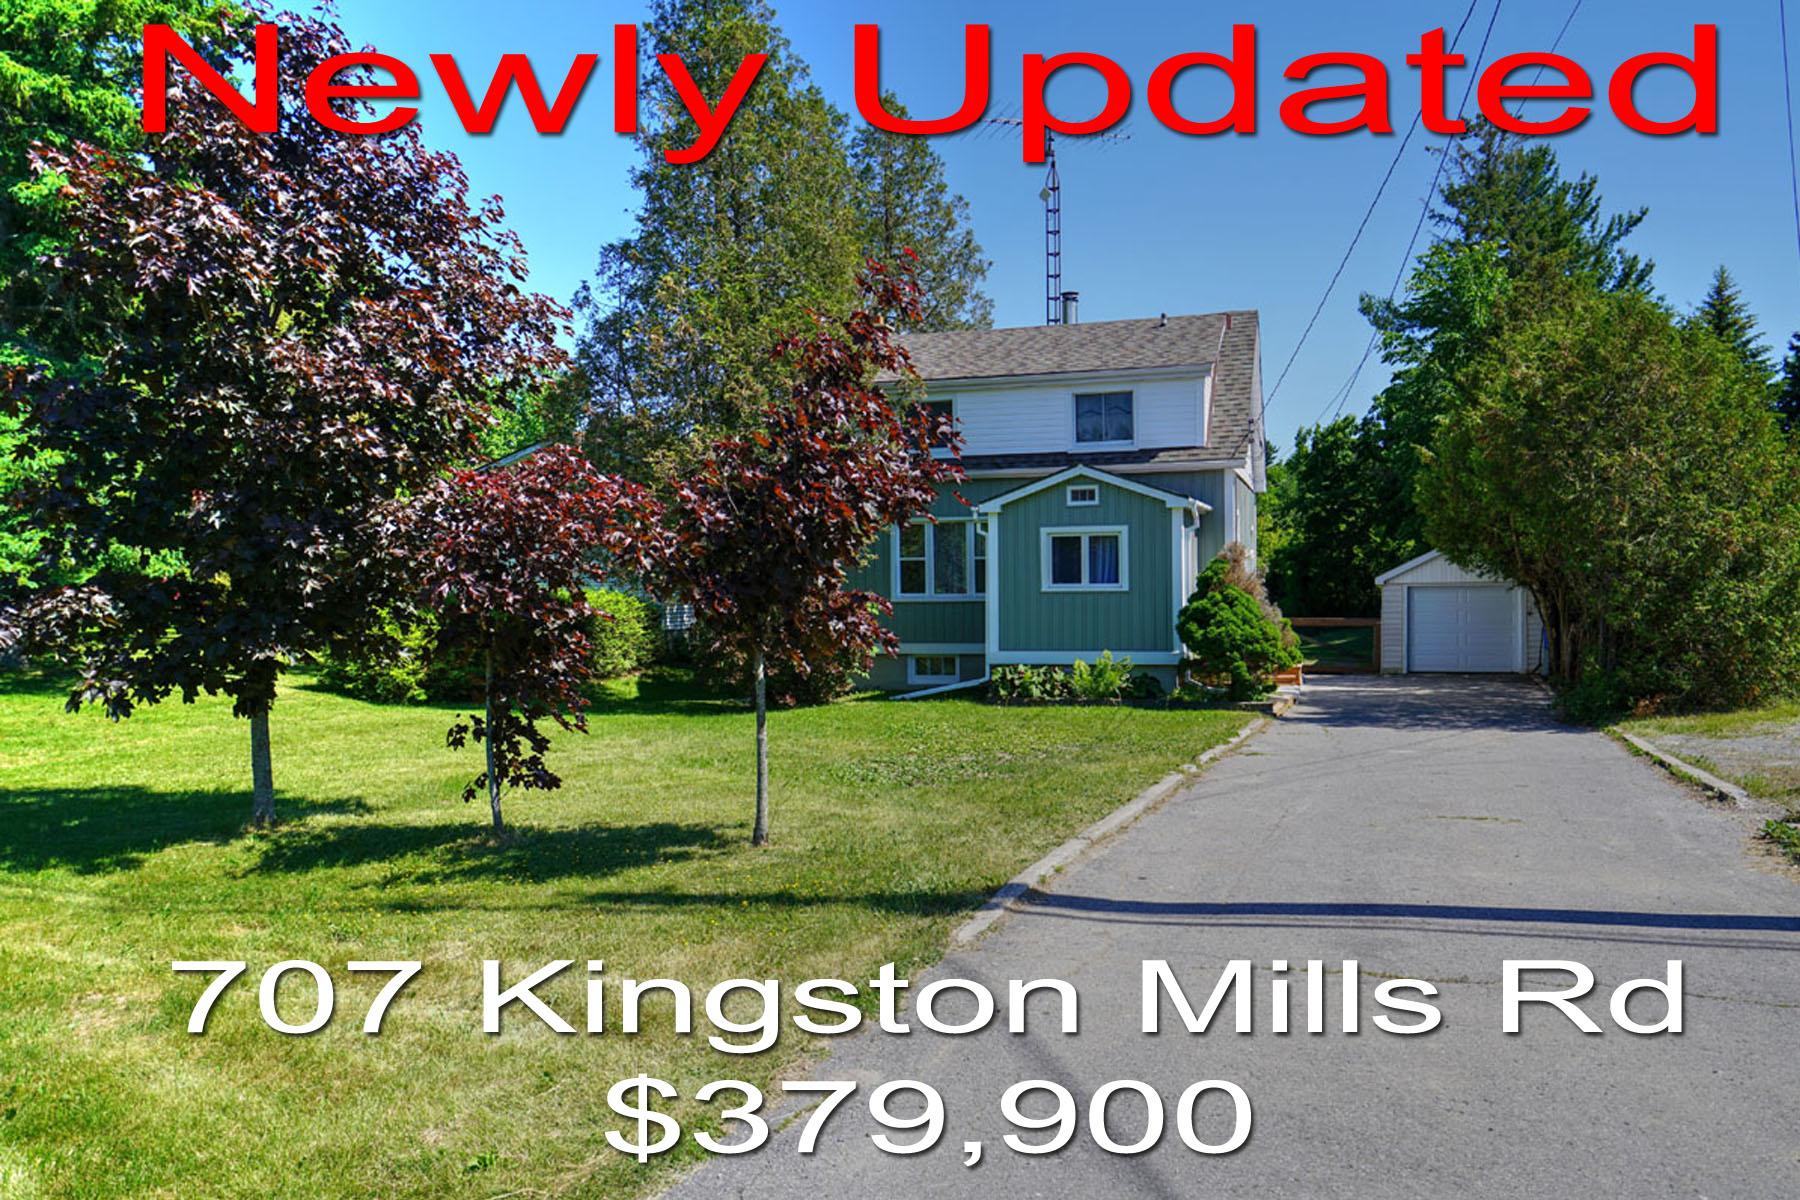 MLS listing 707 Kingston Mills Rd, Kingston ON